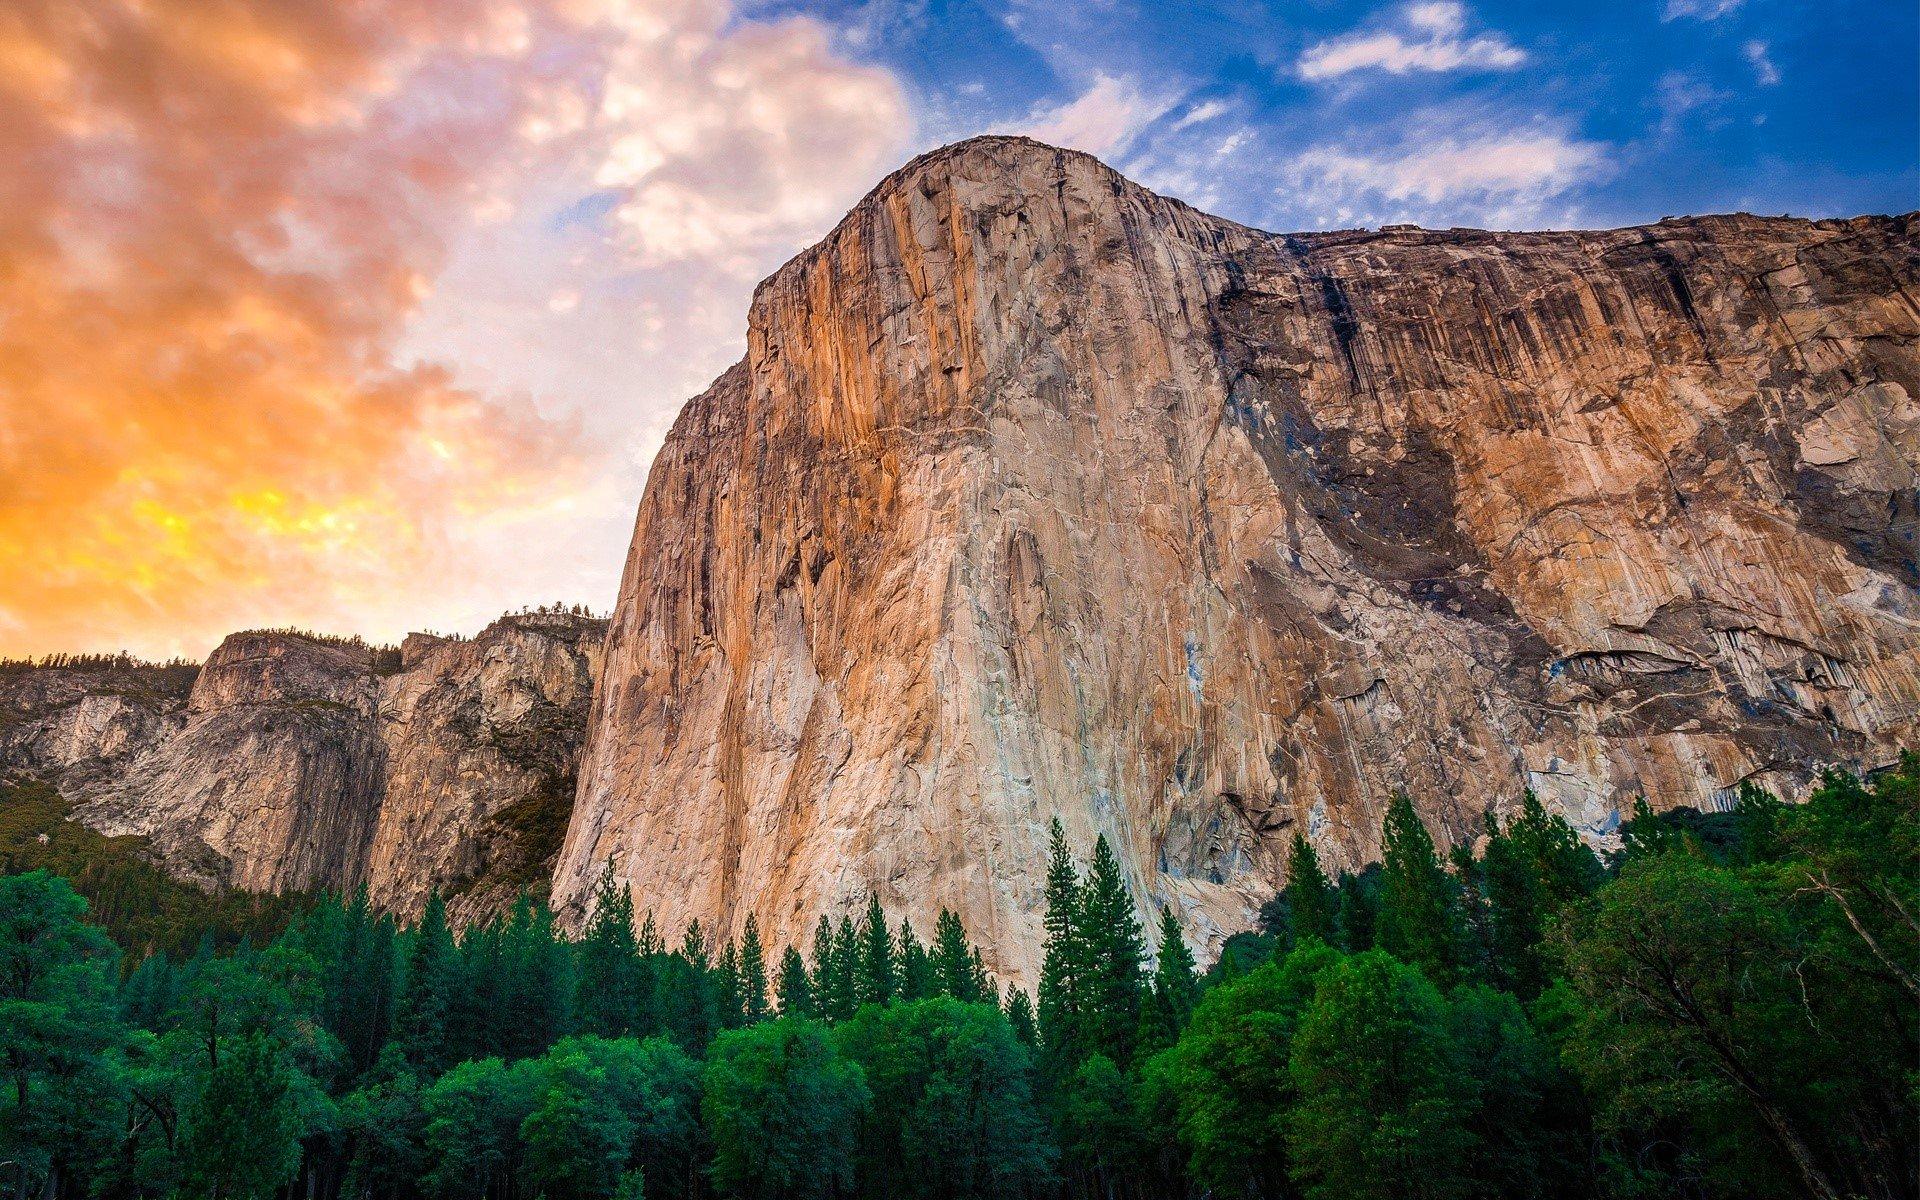 Fondos de pantalla Montañas Yosemite